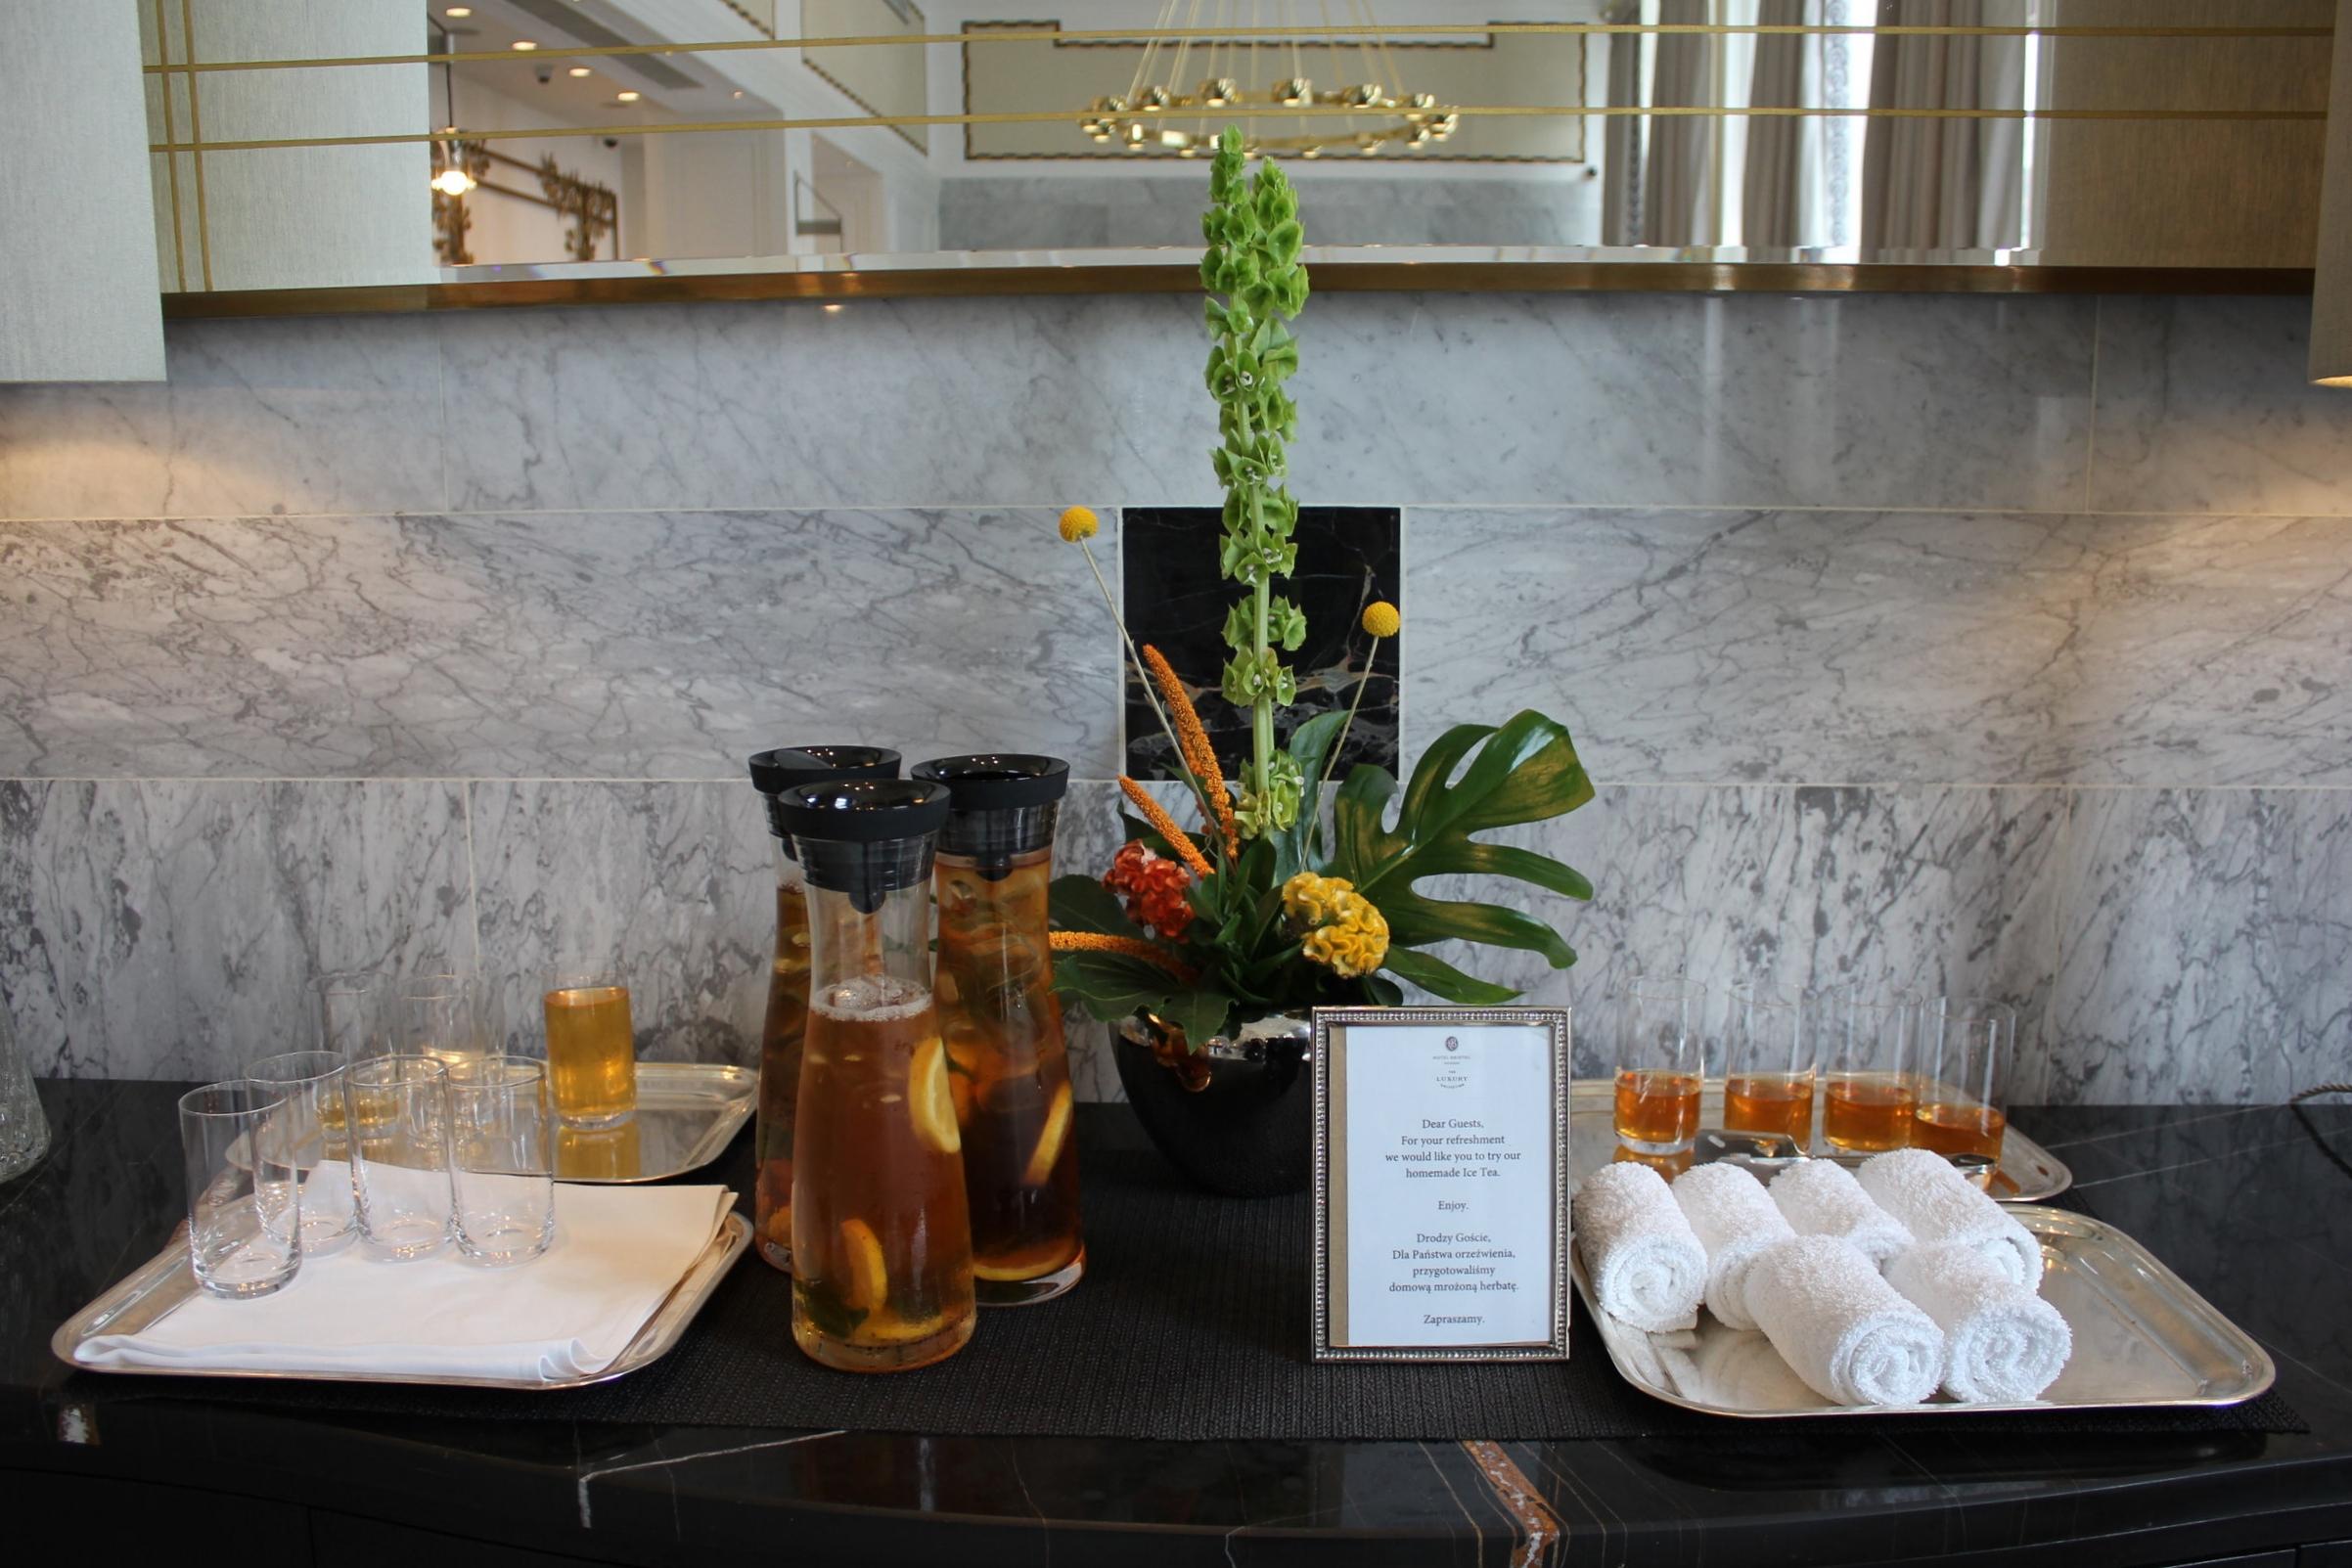 Hotel Bristol Warsaw – Check-in amenities